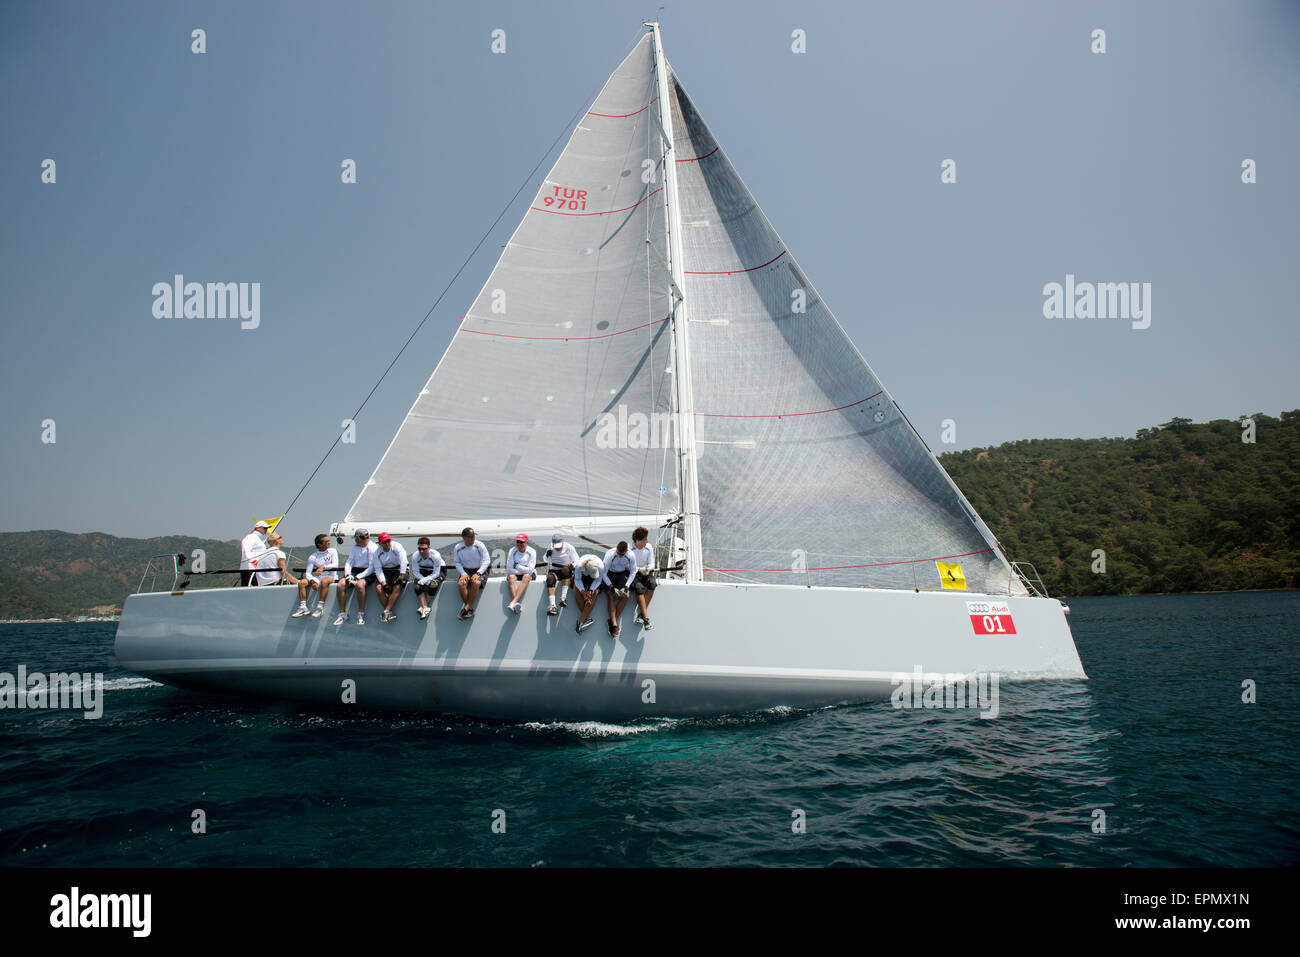 Sailing race in Göcek Fethiye Turkey - Stock Image